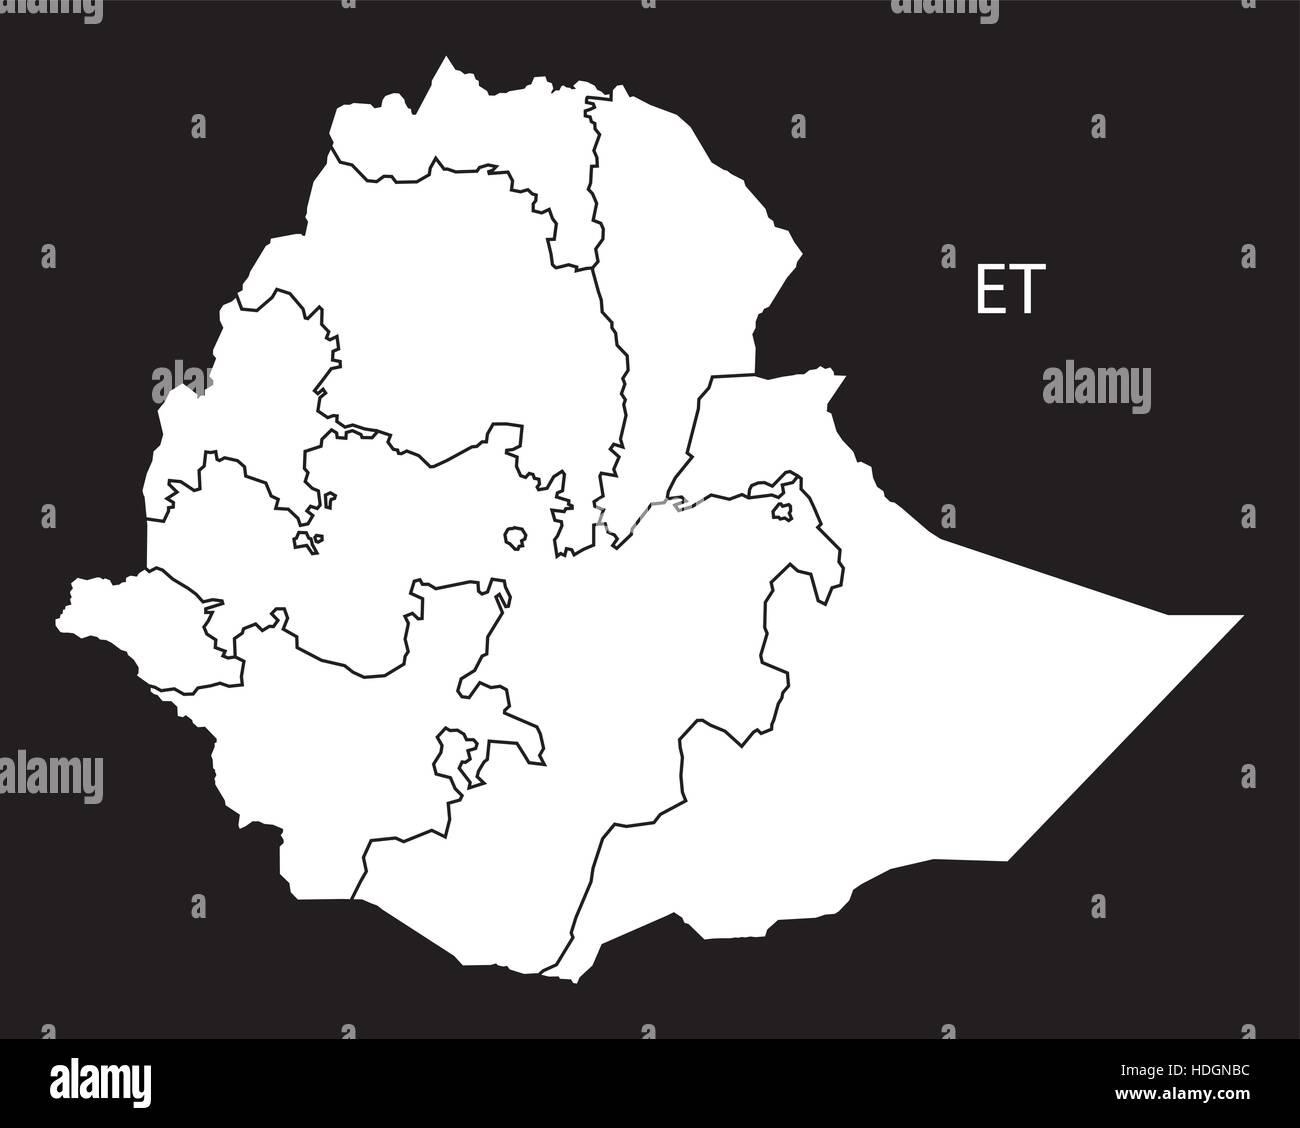 Ethiopia regions Map black and white illustration - Stock Vector